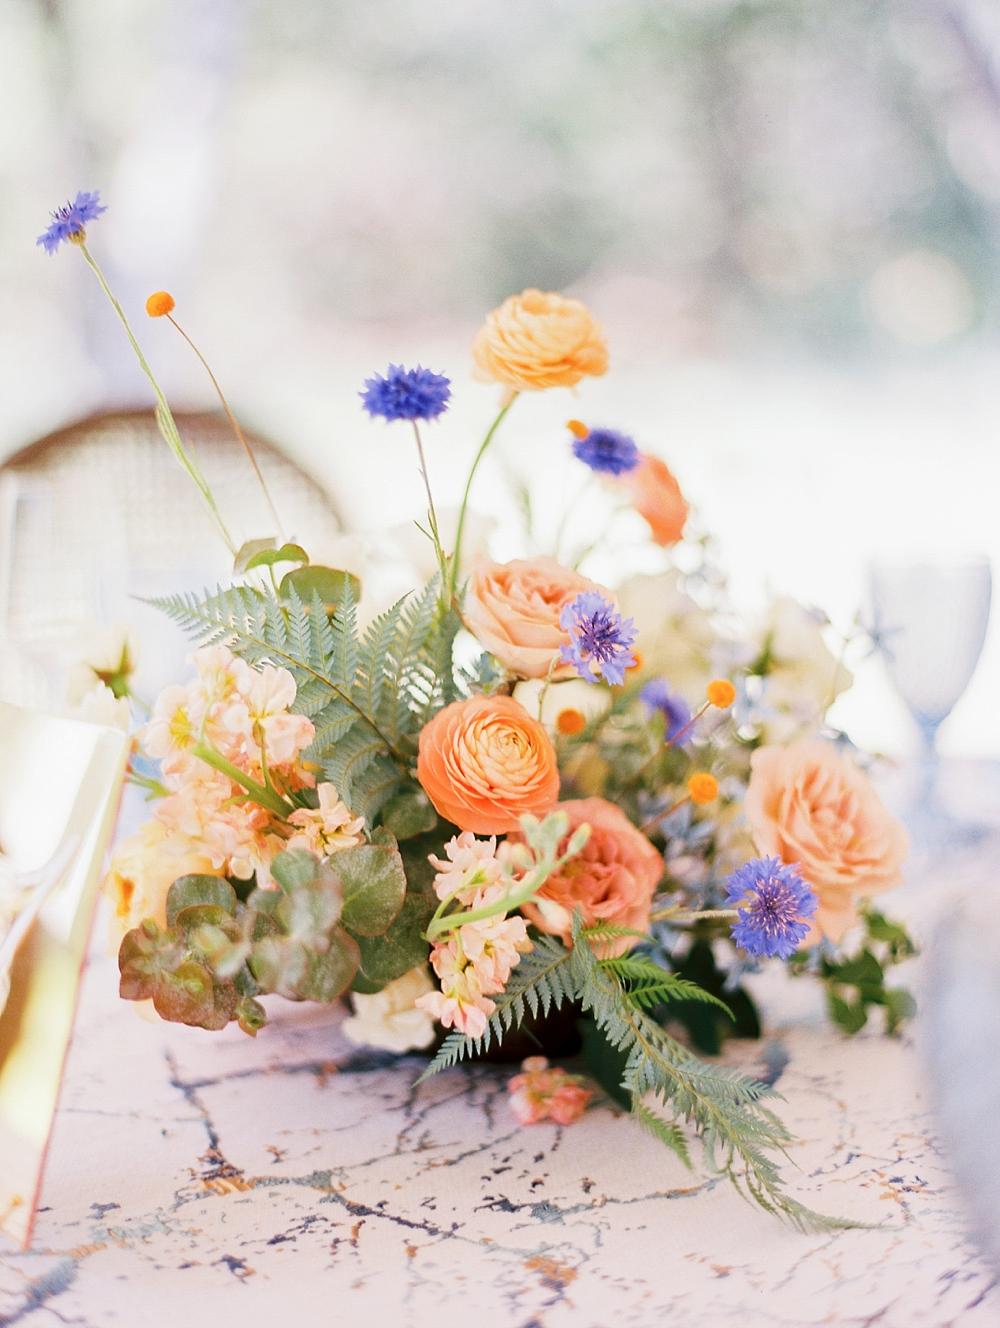 Kristin-La-Voie-Photography-Austin-Wedding-Photographer-the-grand-lady-39